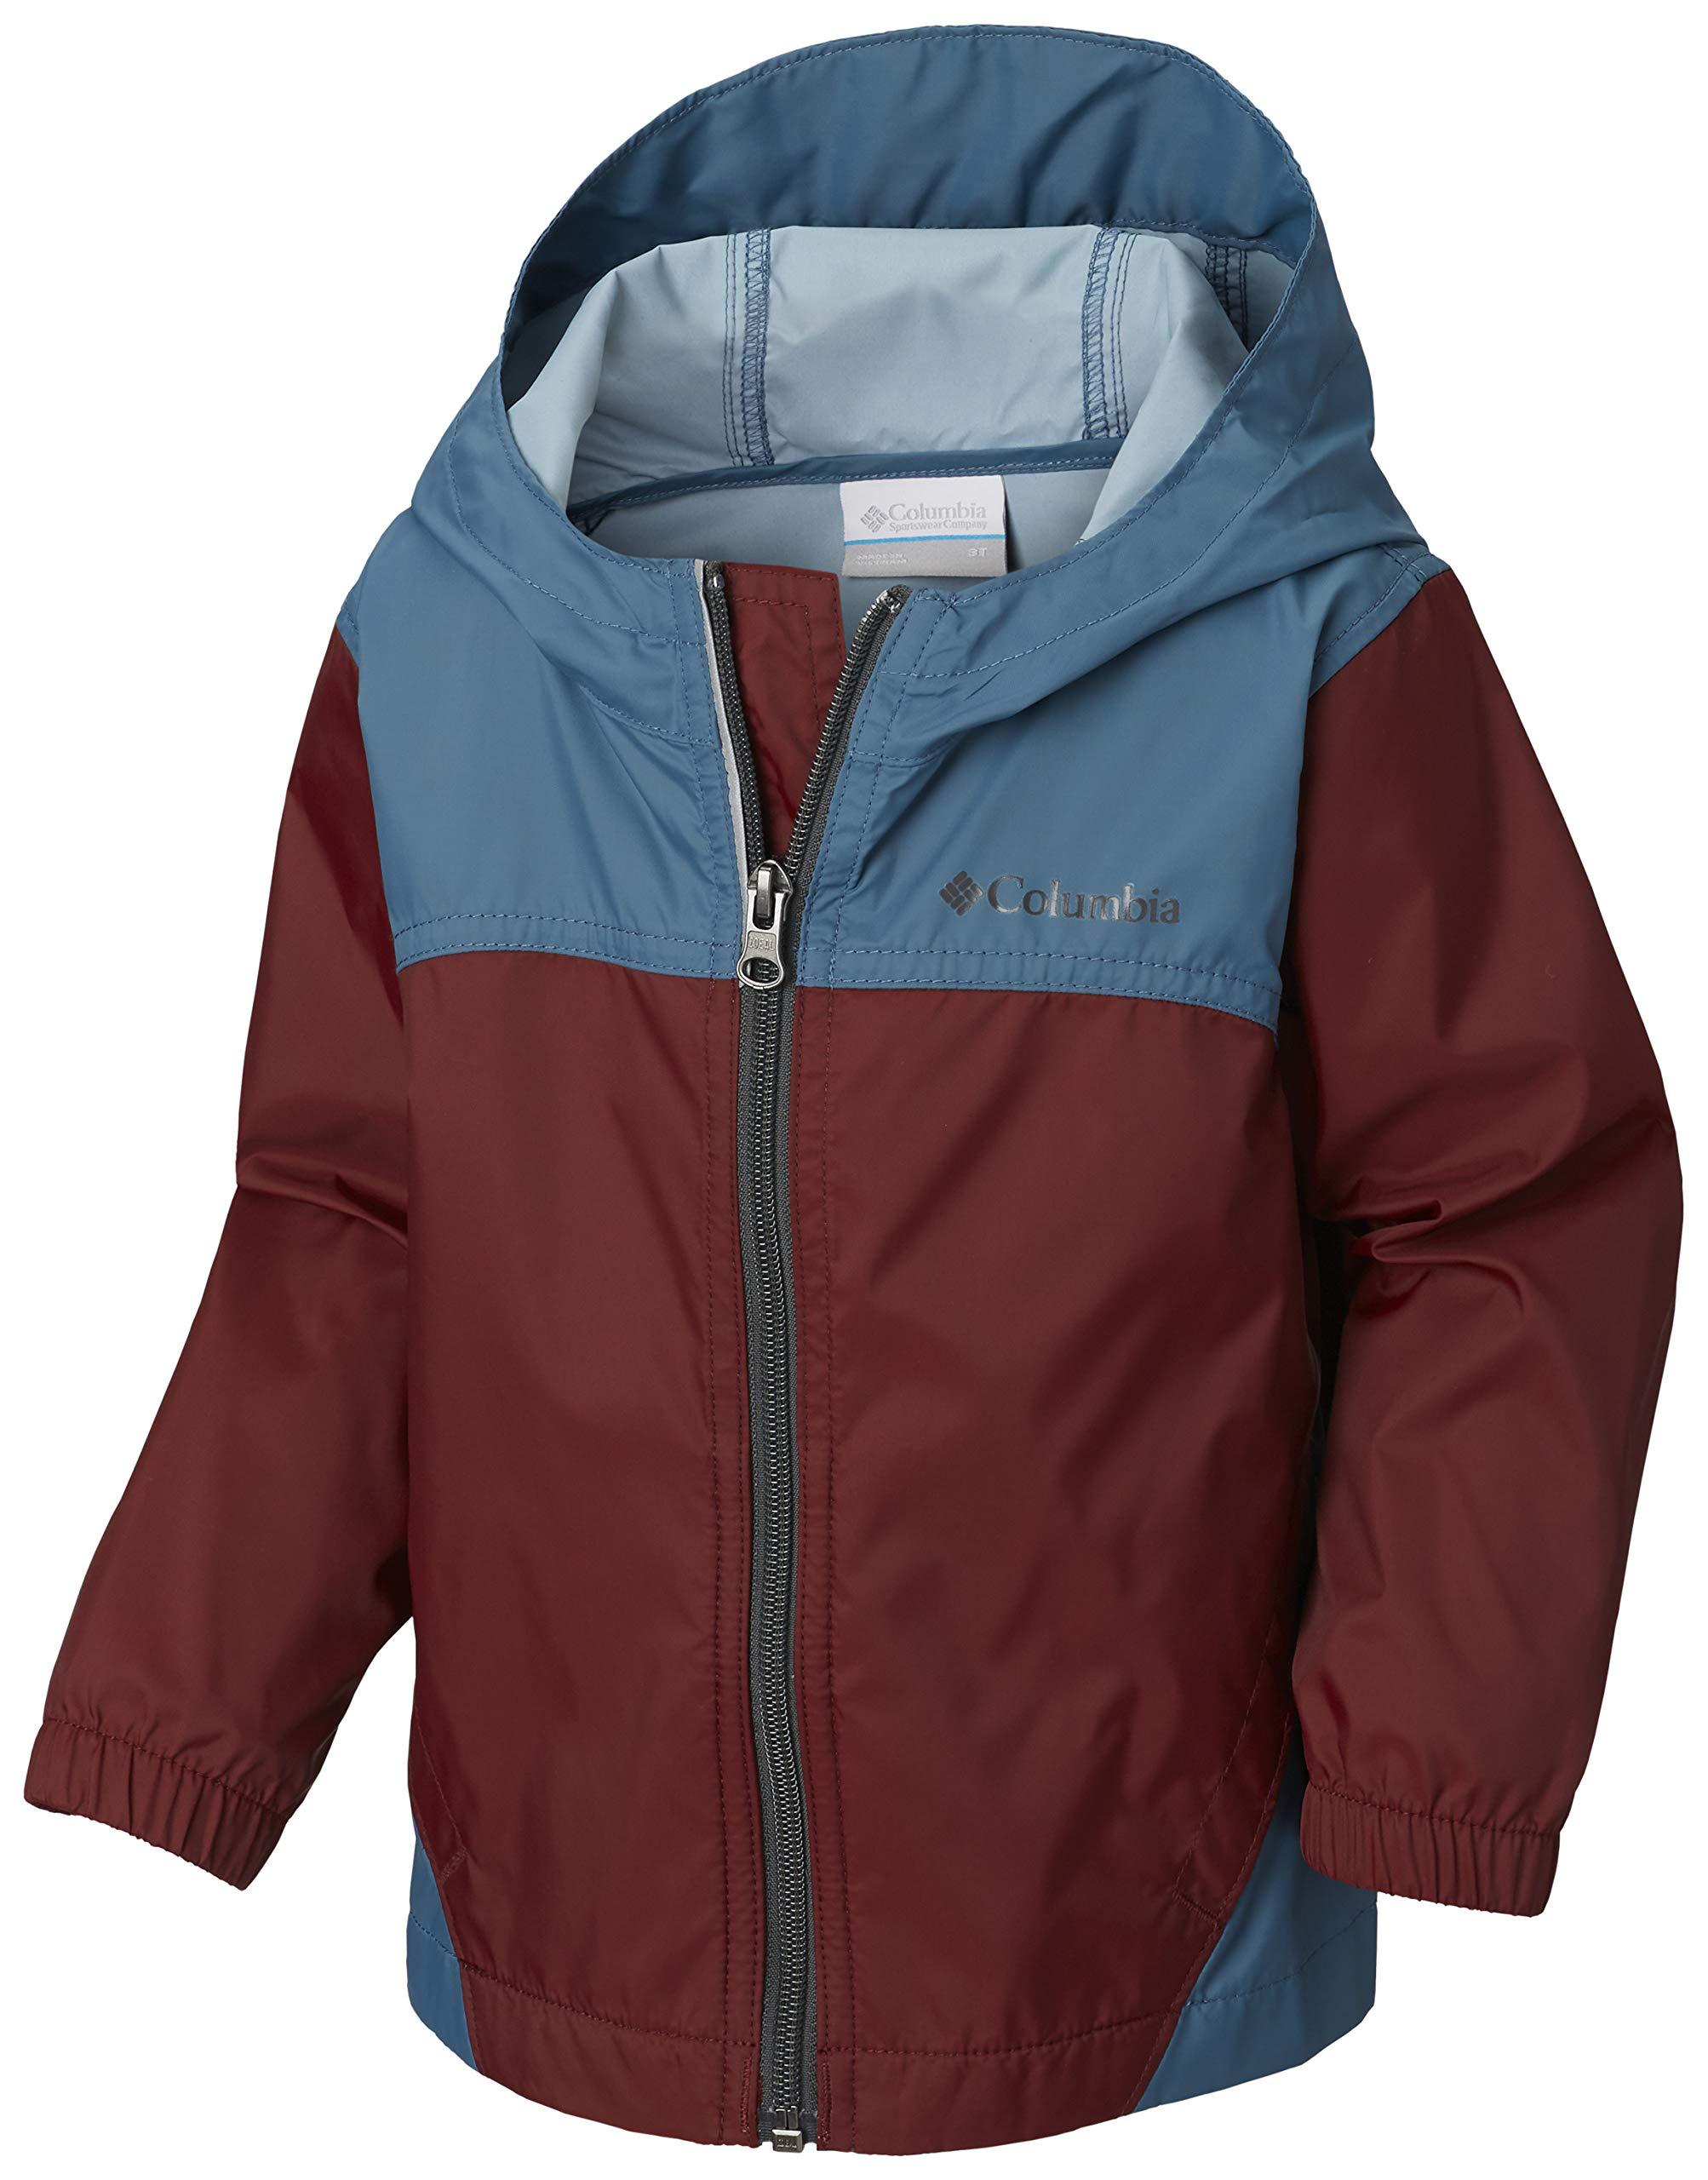 Columbia Boys' Little' Glennaker Rain Jacket Tapestry/Blue Heron X-Small